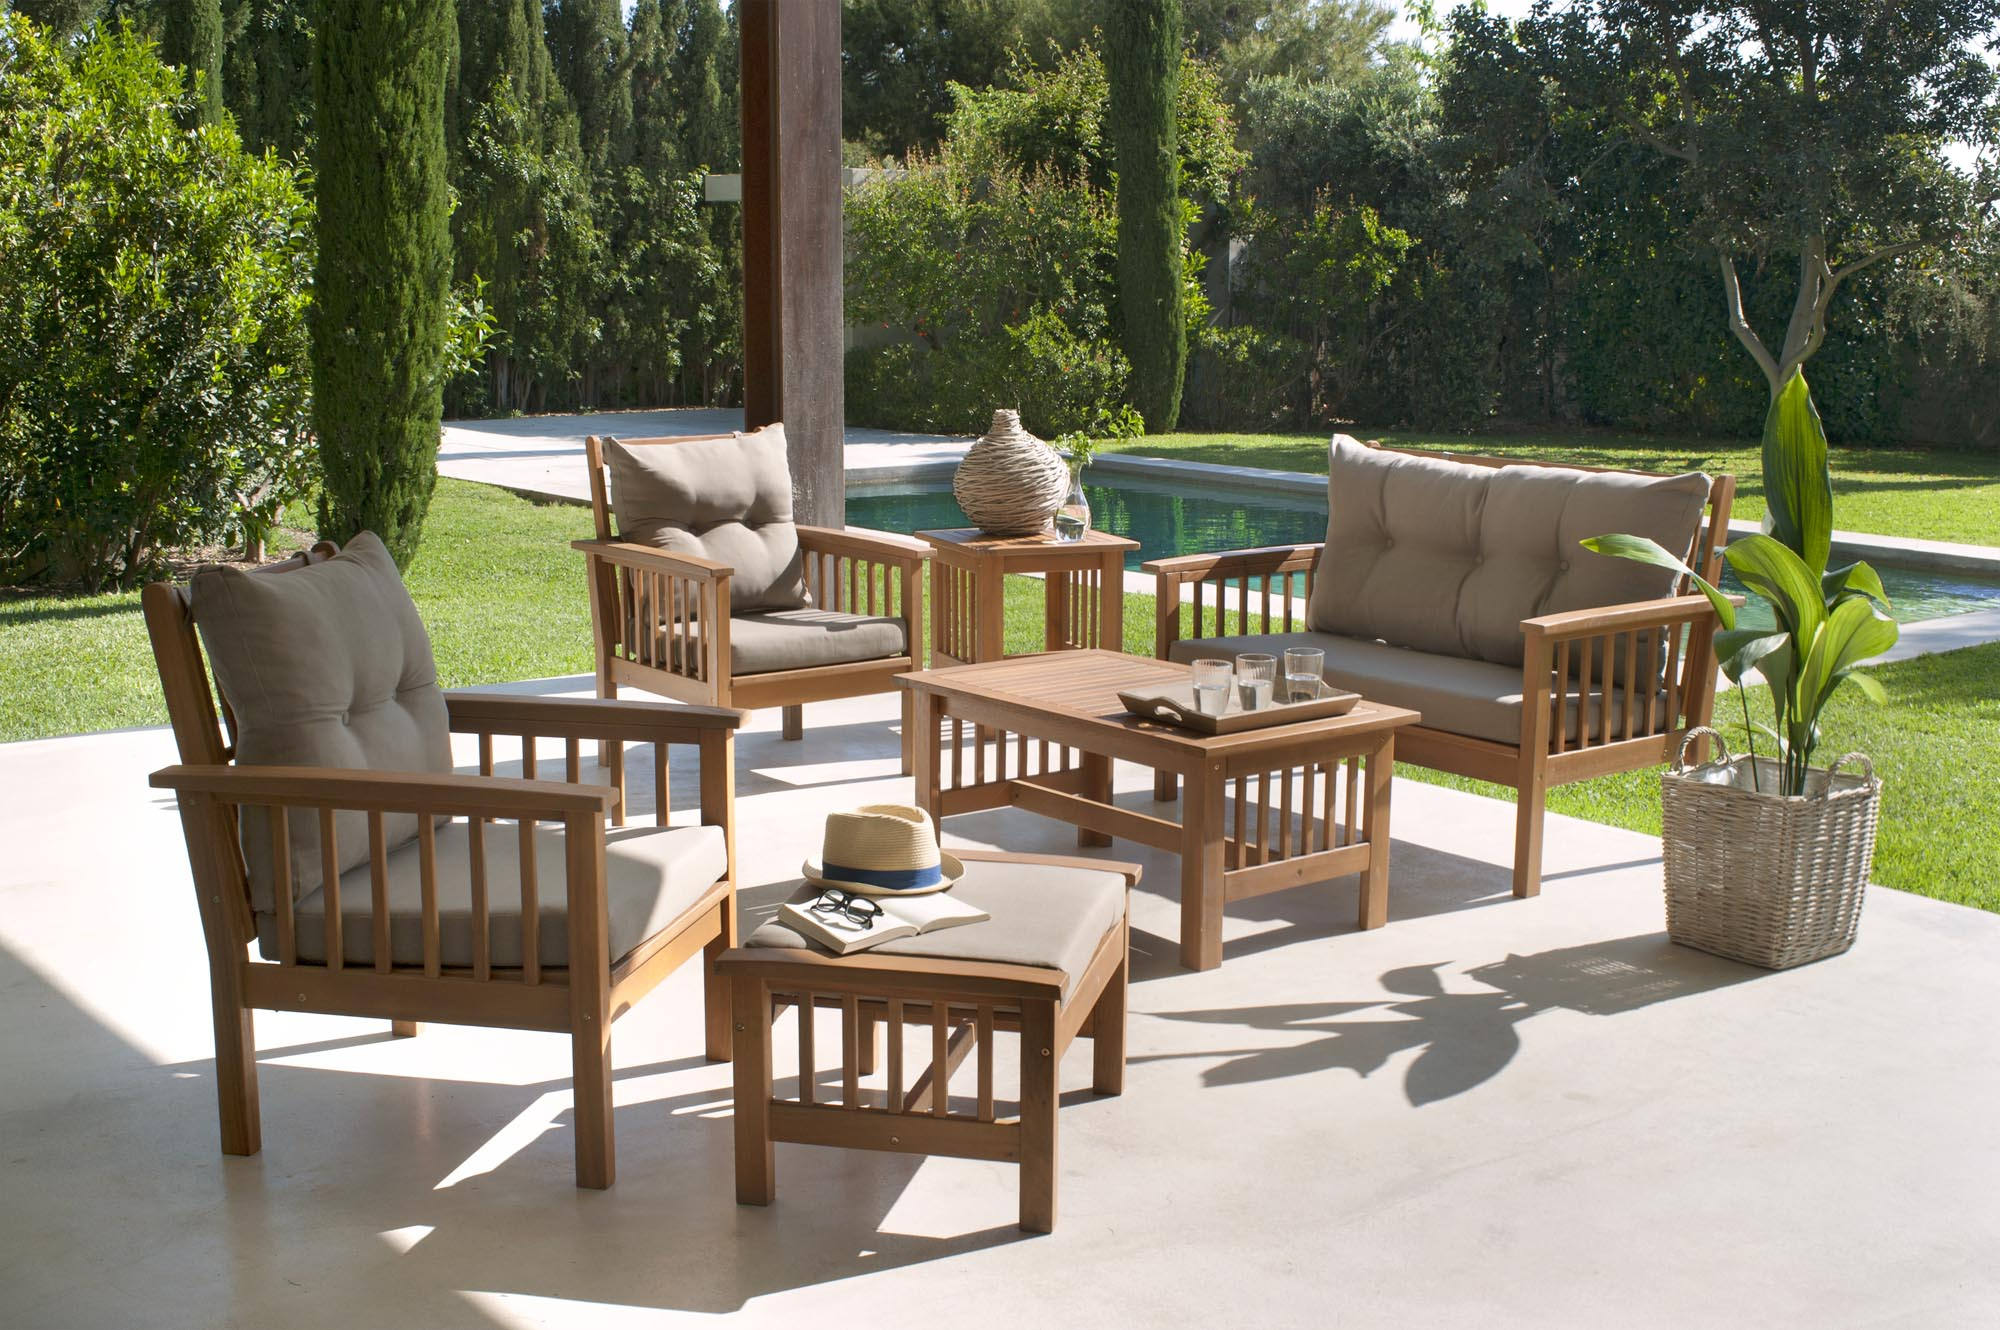 Transat Jardin Carrefour - Canalcncarauca concernant Salon Jardin Resine Tressee Carrefour